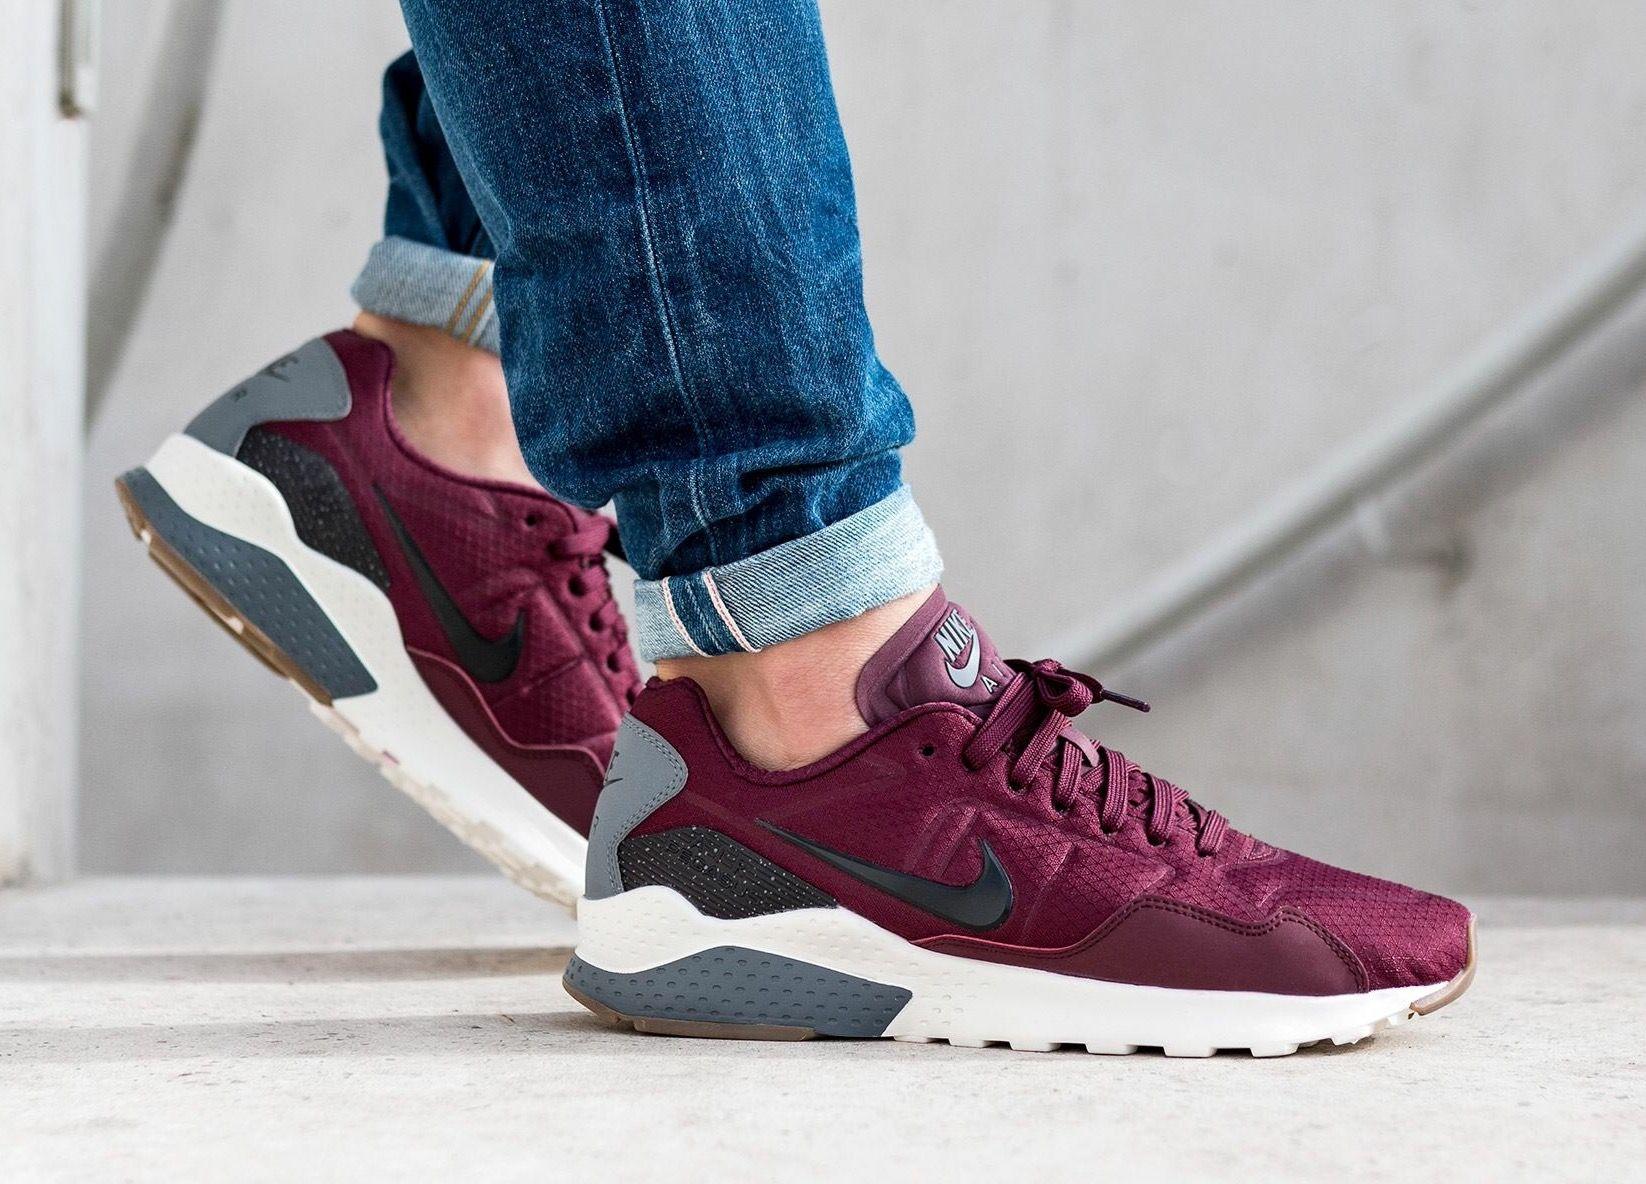 bas prix 74a9b 95163 Nike Air Pegasus 93 | shoes in 2019 | Sneakers nike, Nike ...